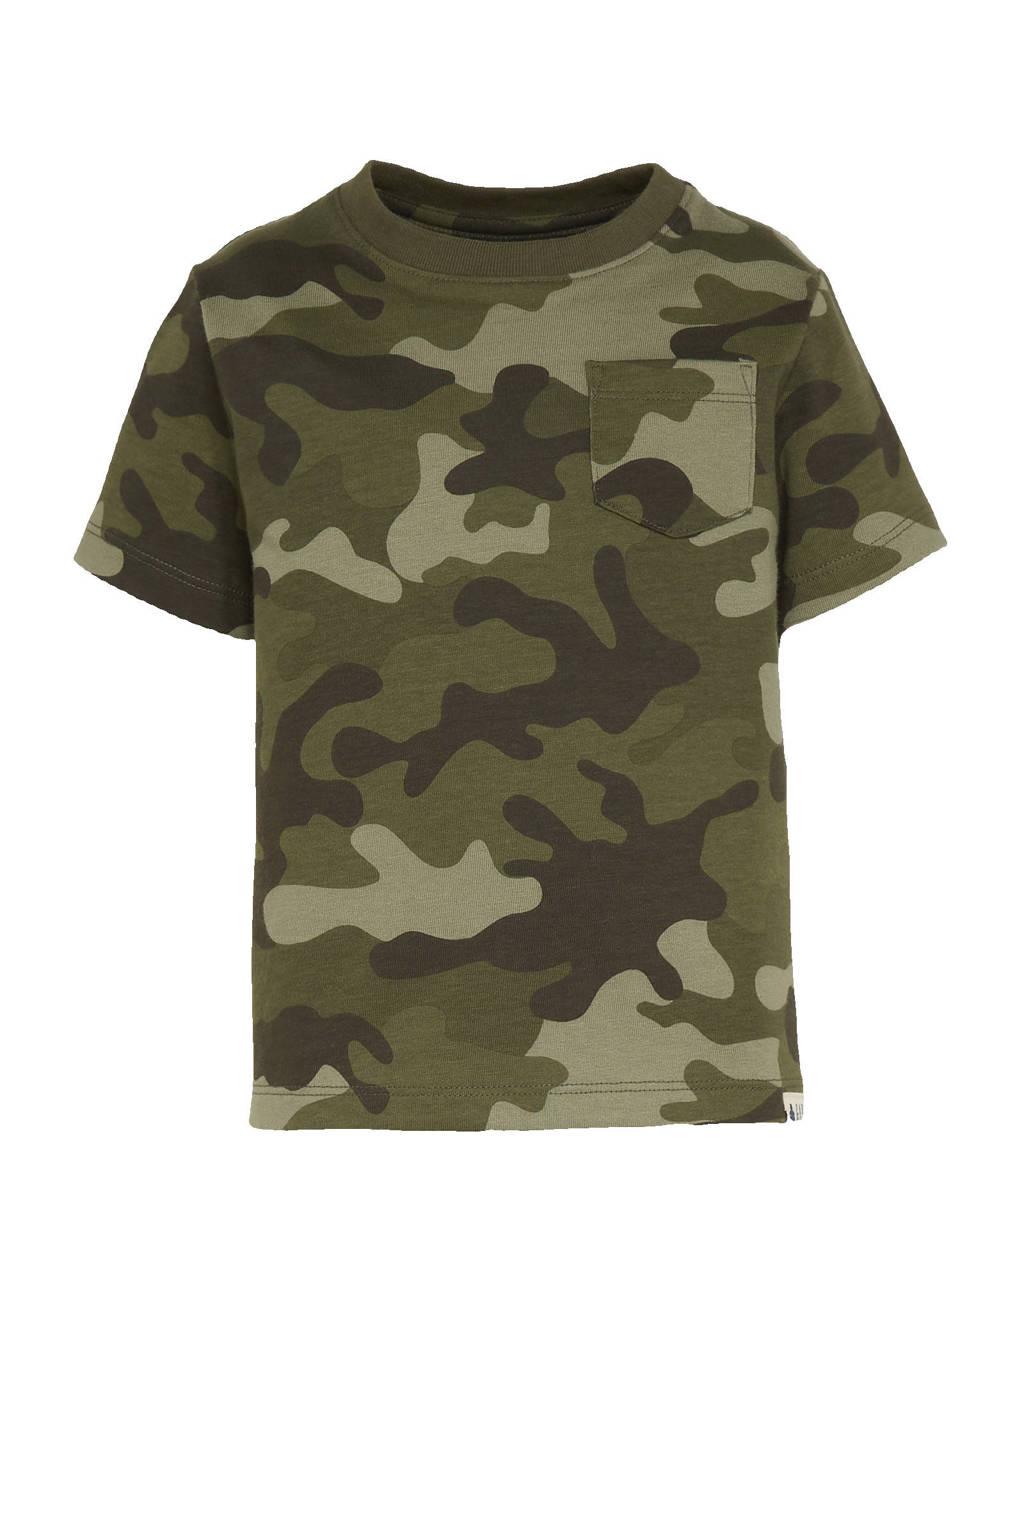 GAP T-shirt met camouflageprint groen, Groen